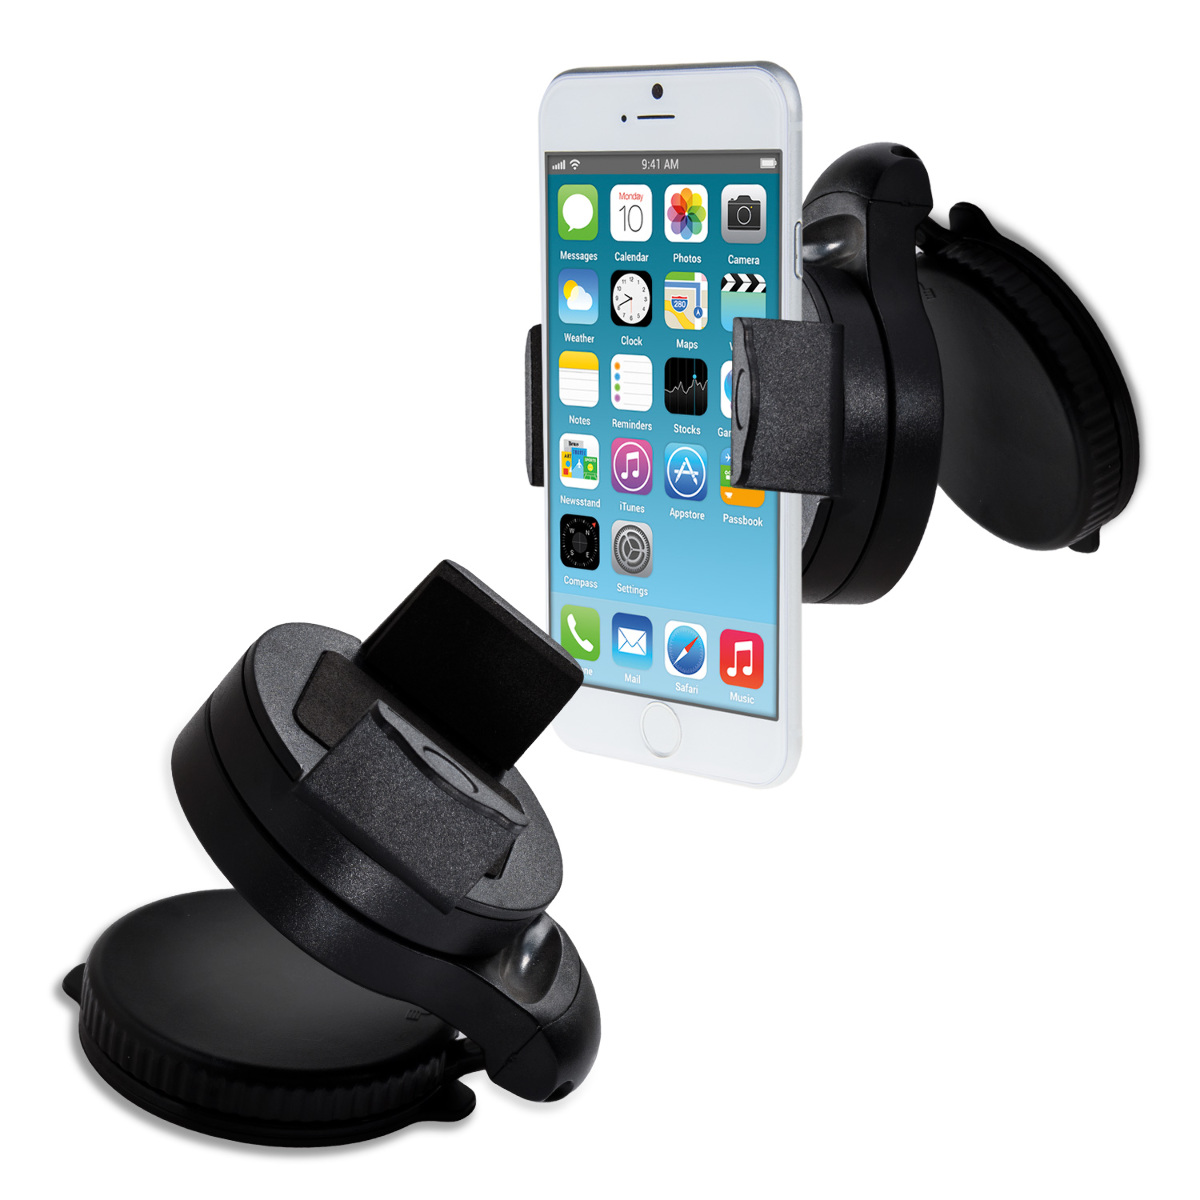 auto halterung apple iphone 6 4 7 unv in kreuzlingen. Black Bedroom Furniture Sets. Home Design Ideas